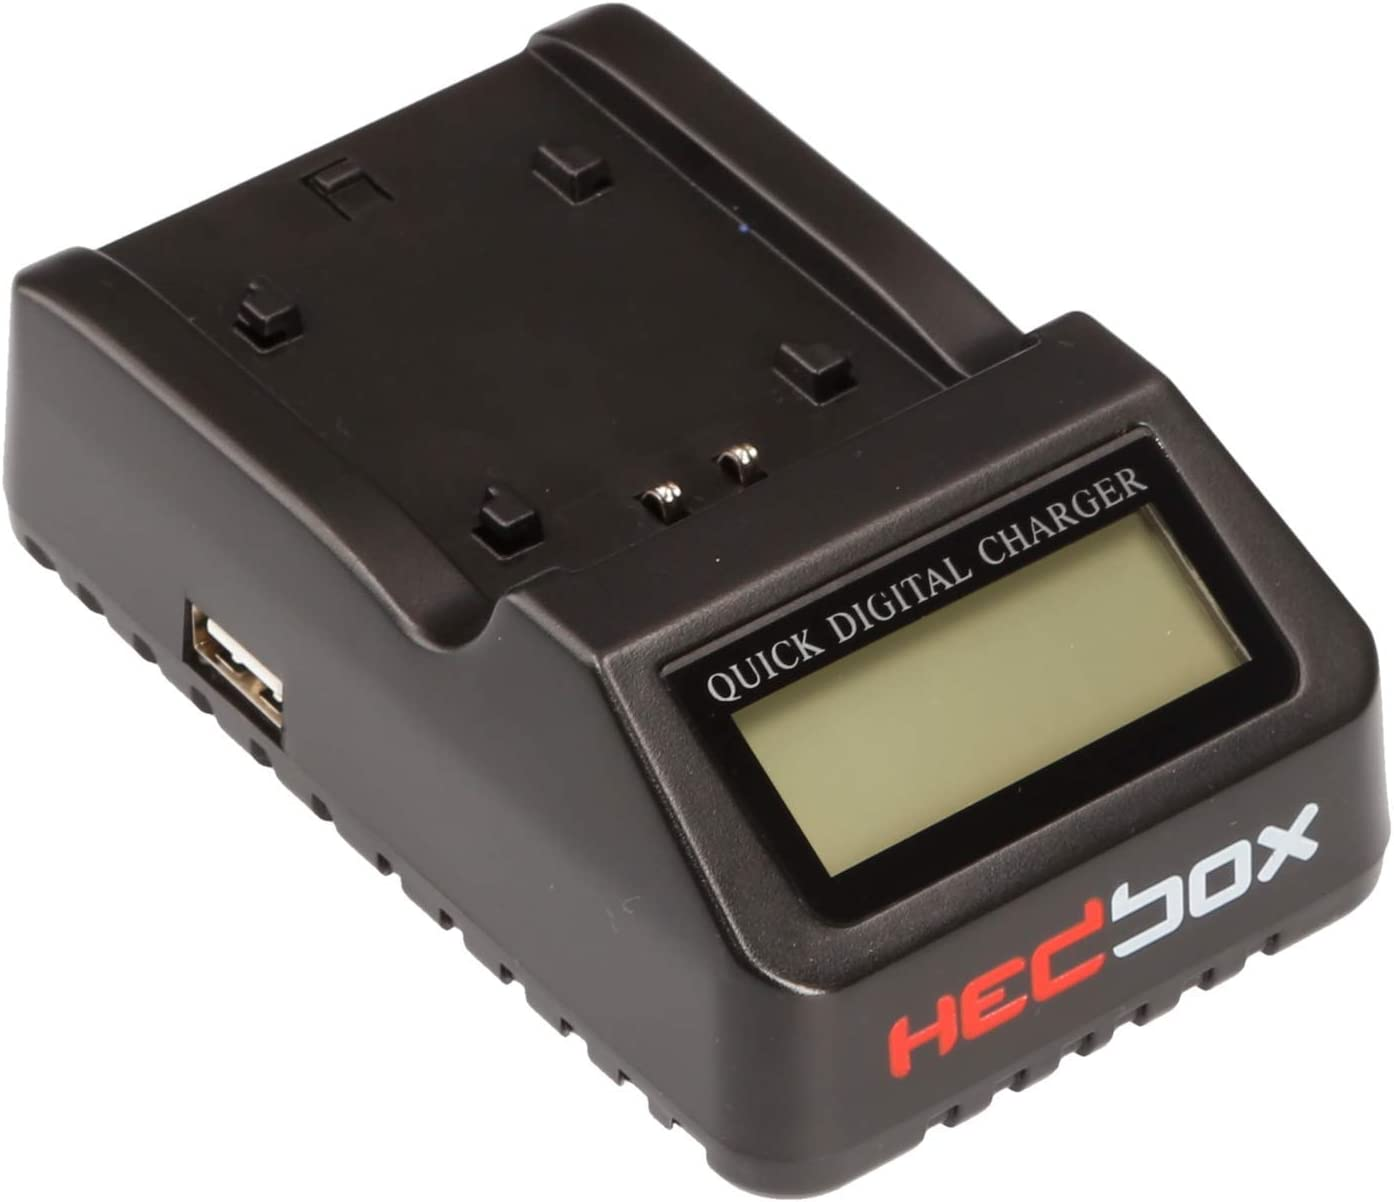 Dual LCD Intelligent Battery Charger Compatible for Sony NP- F550//F570//F750//F770//F930//F950//F960//F970 NP-FM50//QM71-D//QM91-D and Hedbox RP- NPF550//NPF770//NPF970//NPF1000 RP-DC50//DFM50 HEDBOX